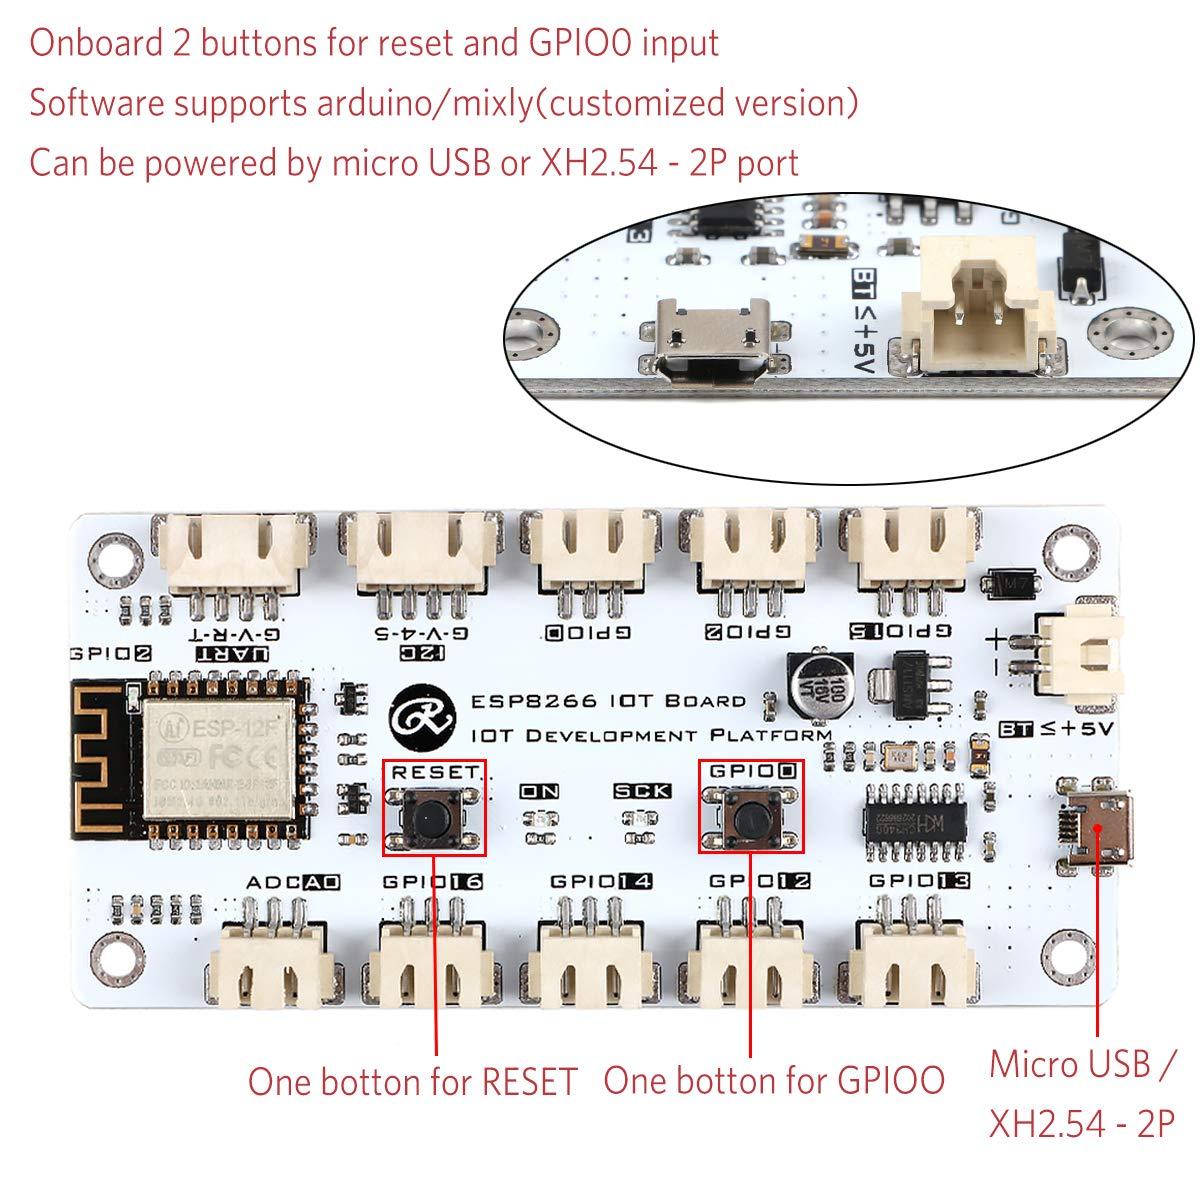 MakerHawk Nodemcu ESP8266 Development Board WiFi Kit with 0.96inch OLED Display Arduino18650 5-12V 500mA for Arduino ESP8266 NodeMCU